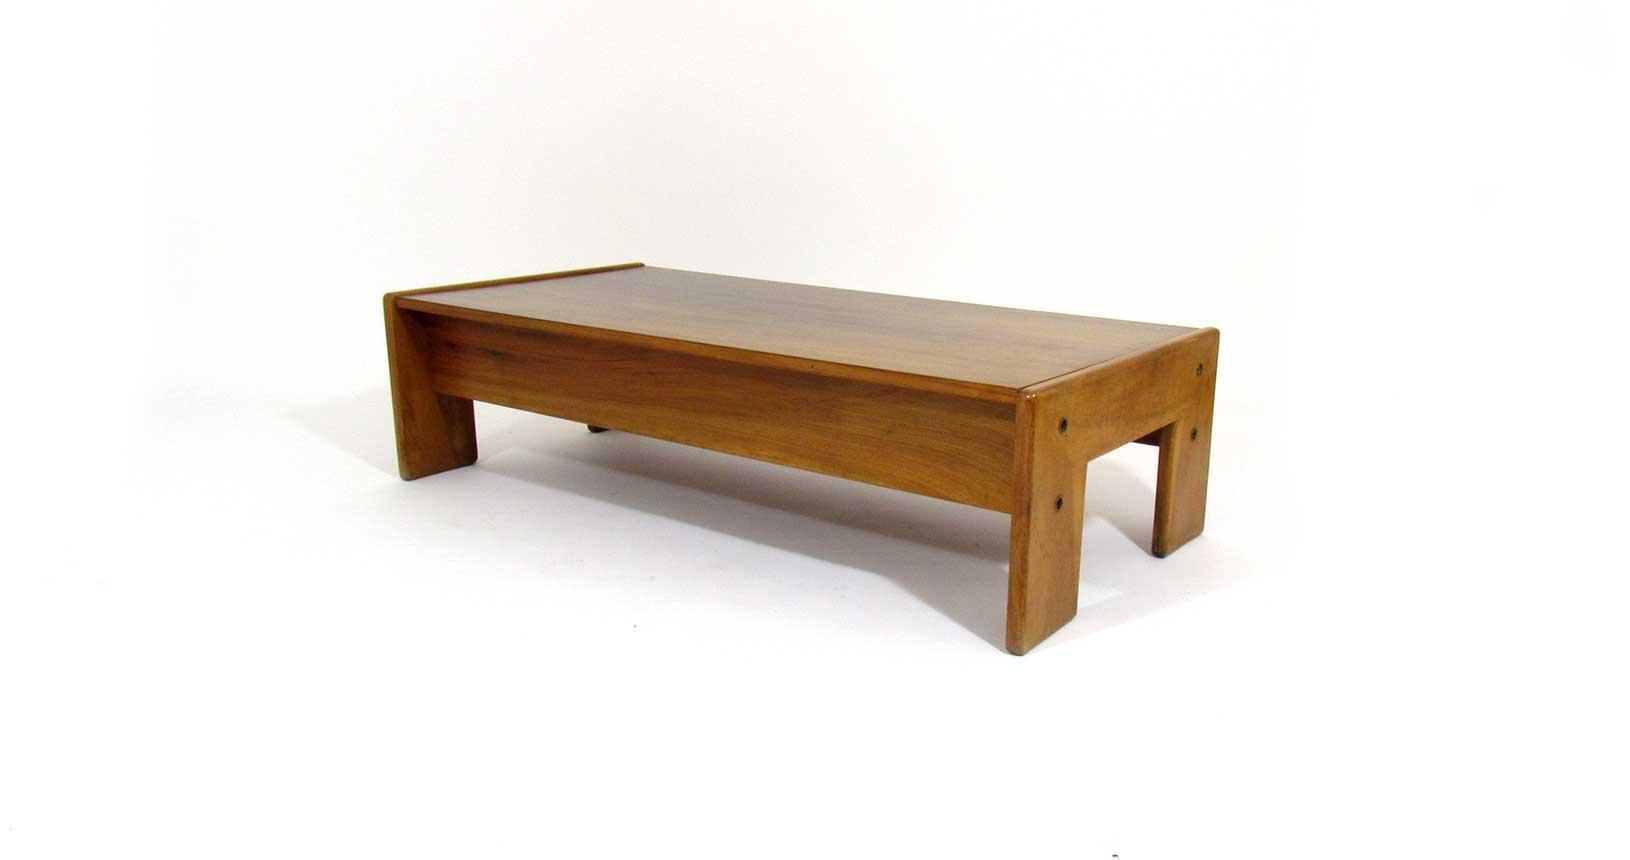 Bastiano table gavina design tobia scarpa knoll afra wood design vintage iconicdesign iconic design